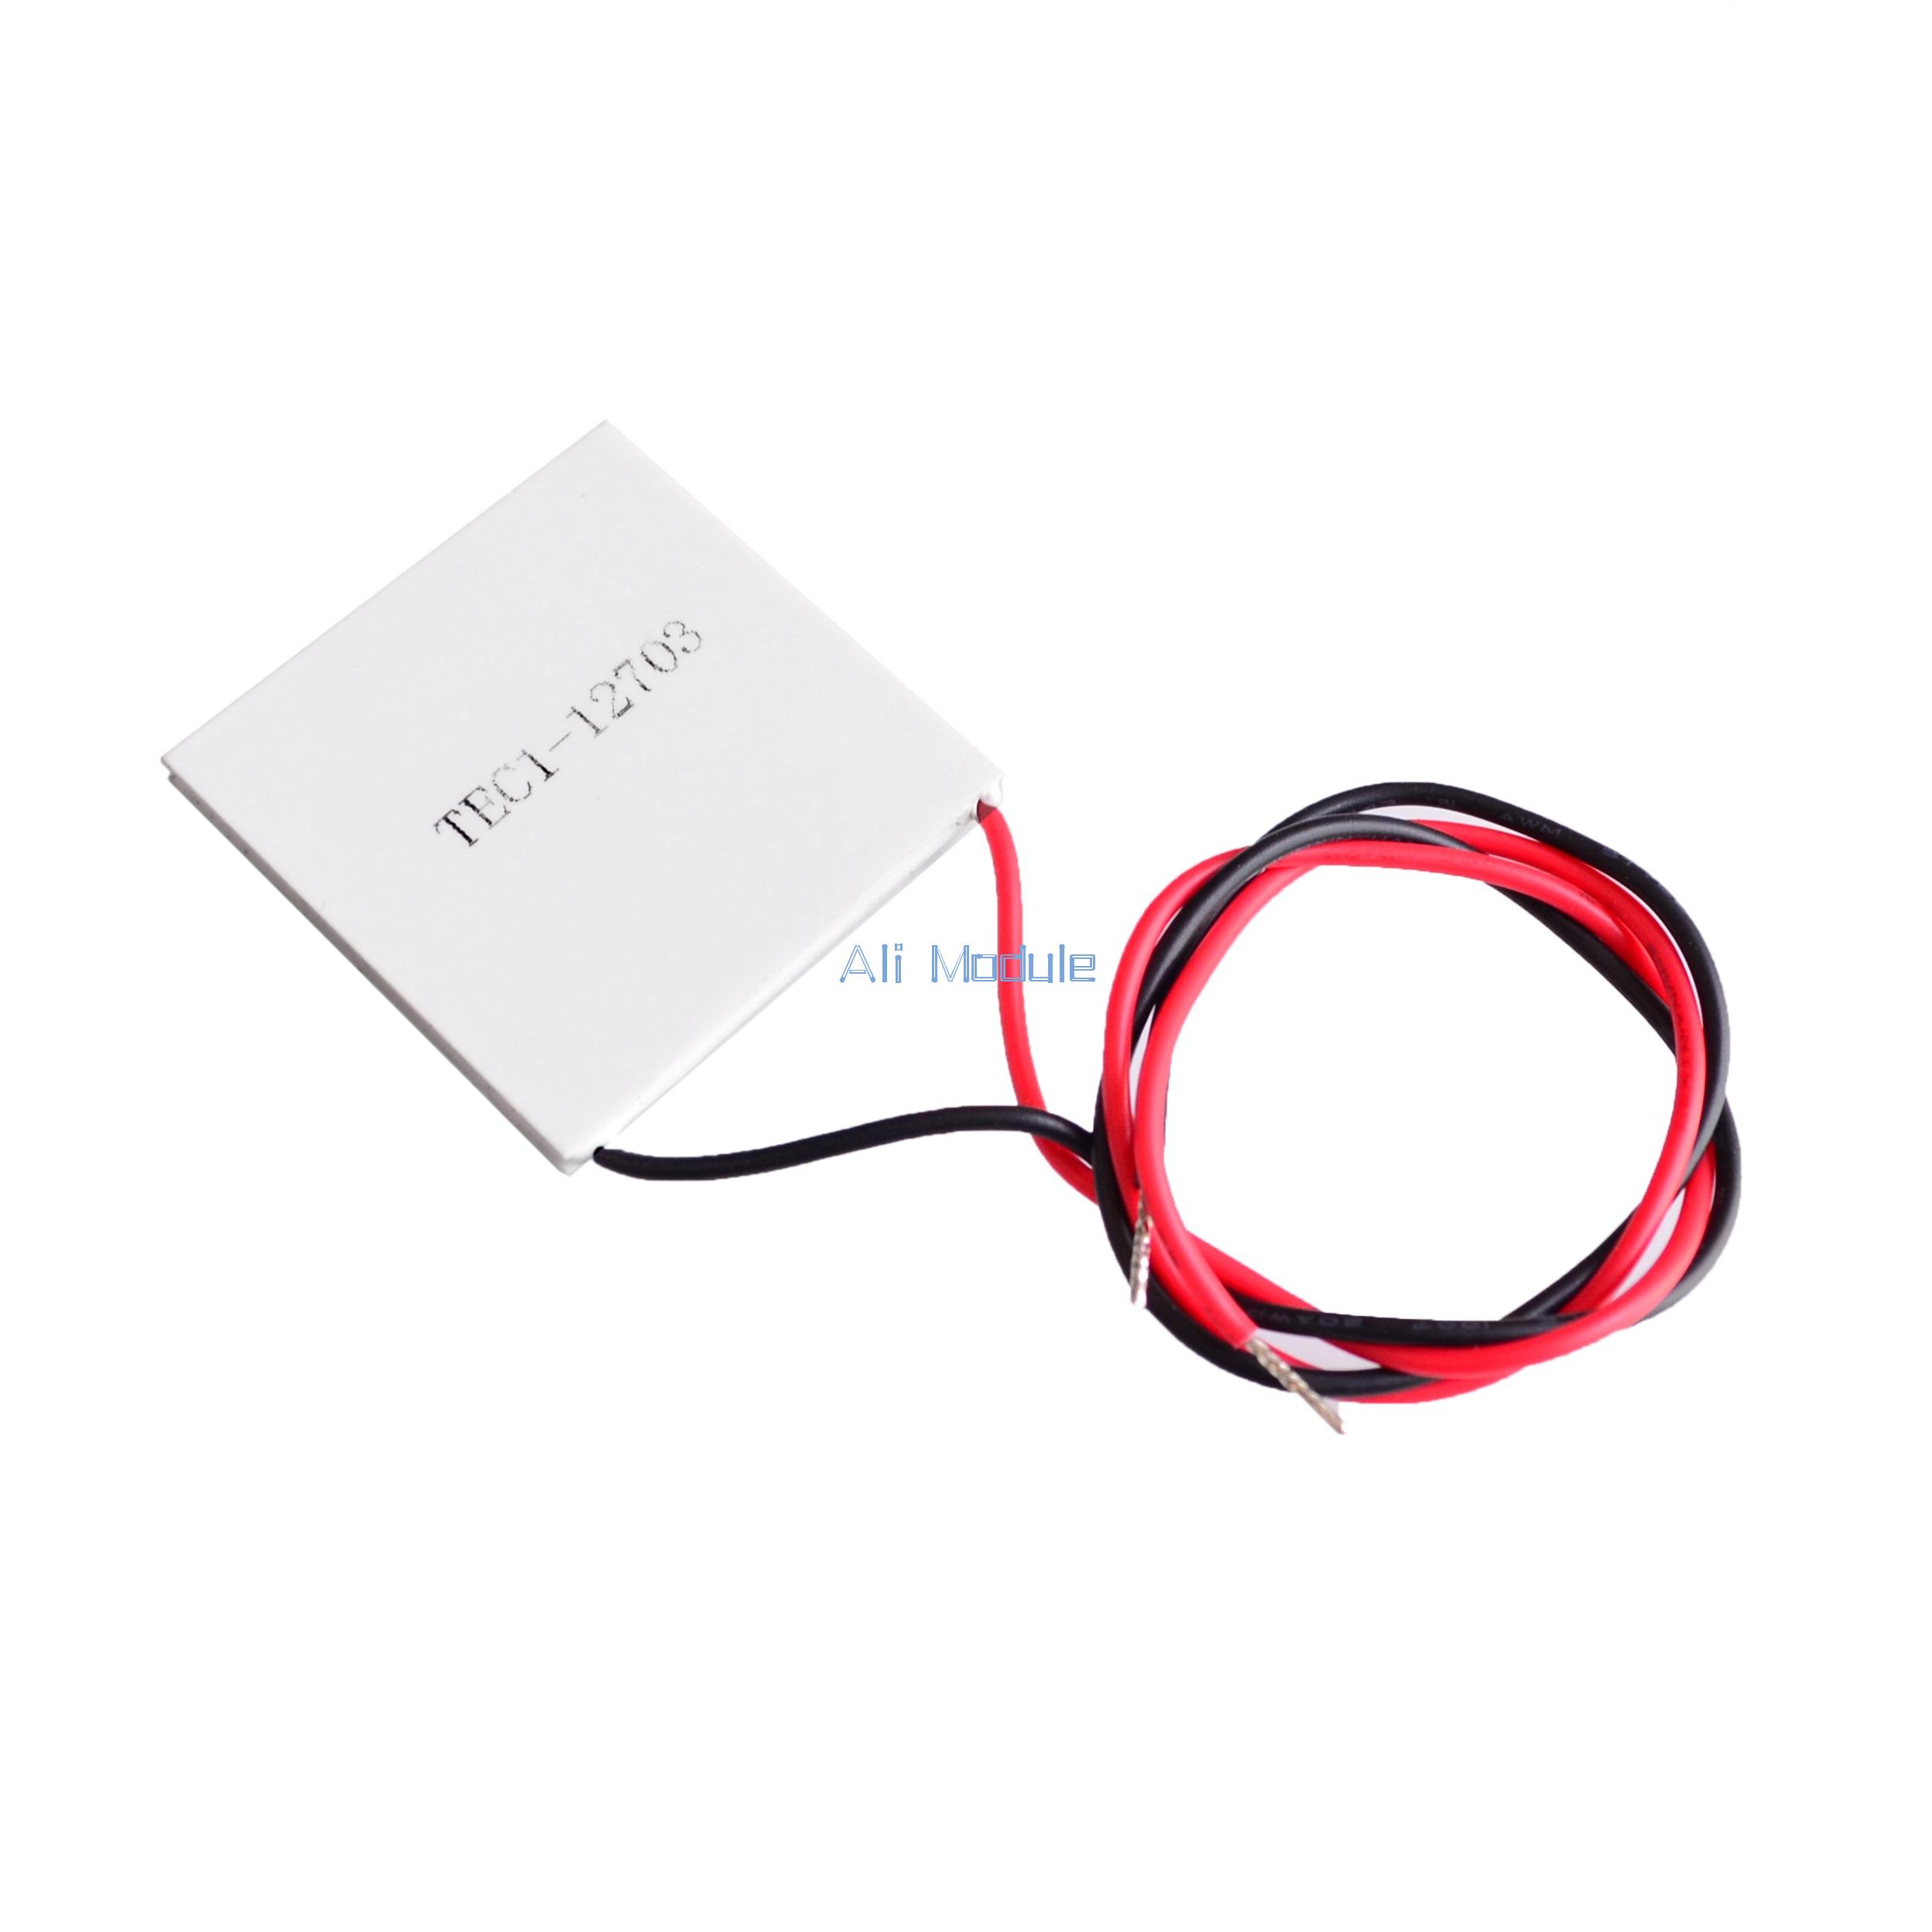 TEC1-12703 Heatsink Thermoelectric Cooler Cooling Peltier Plate Module